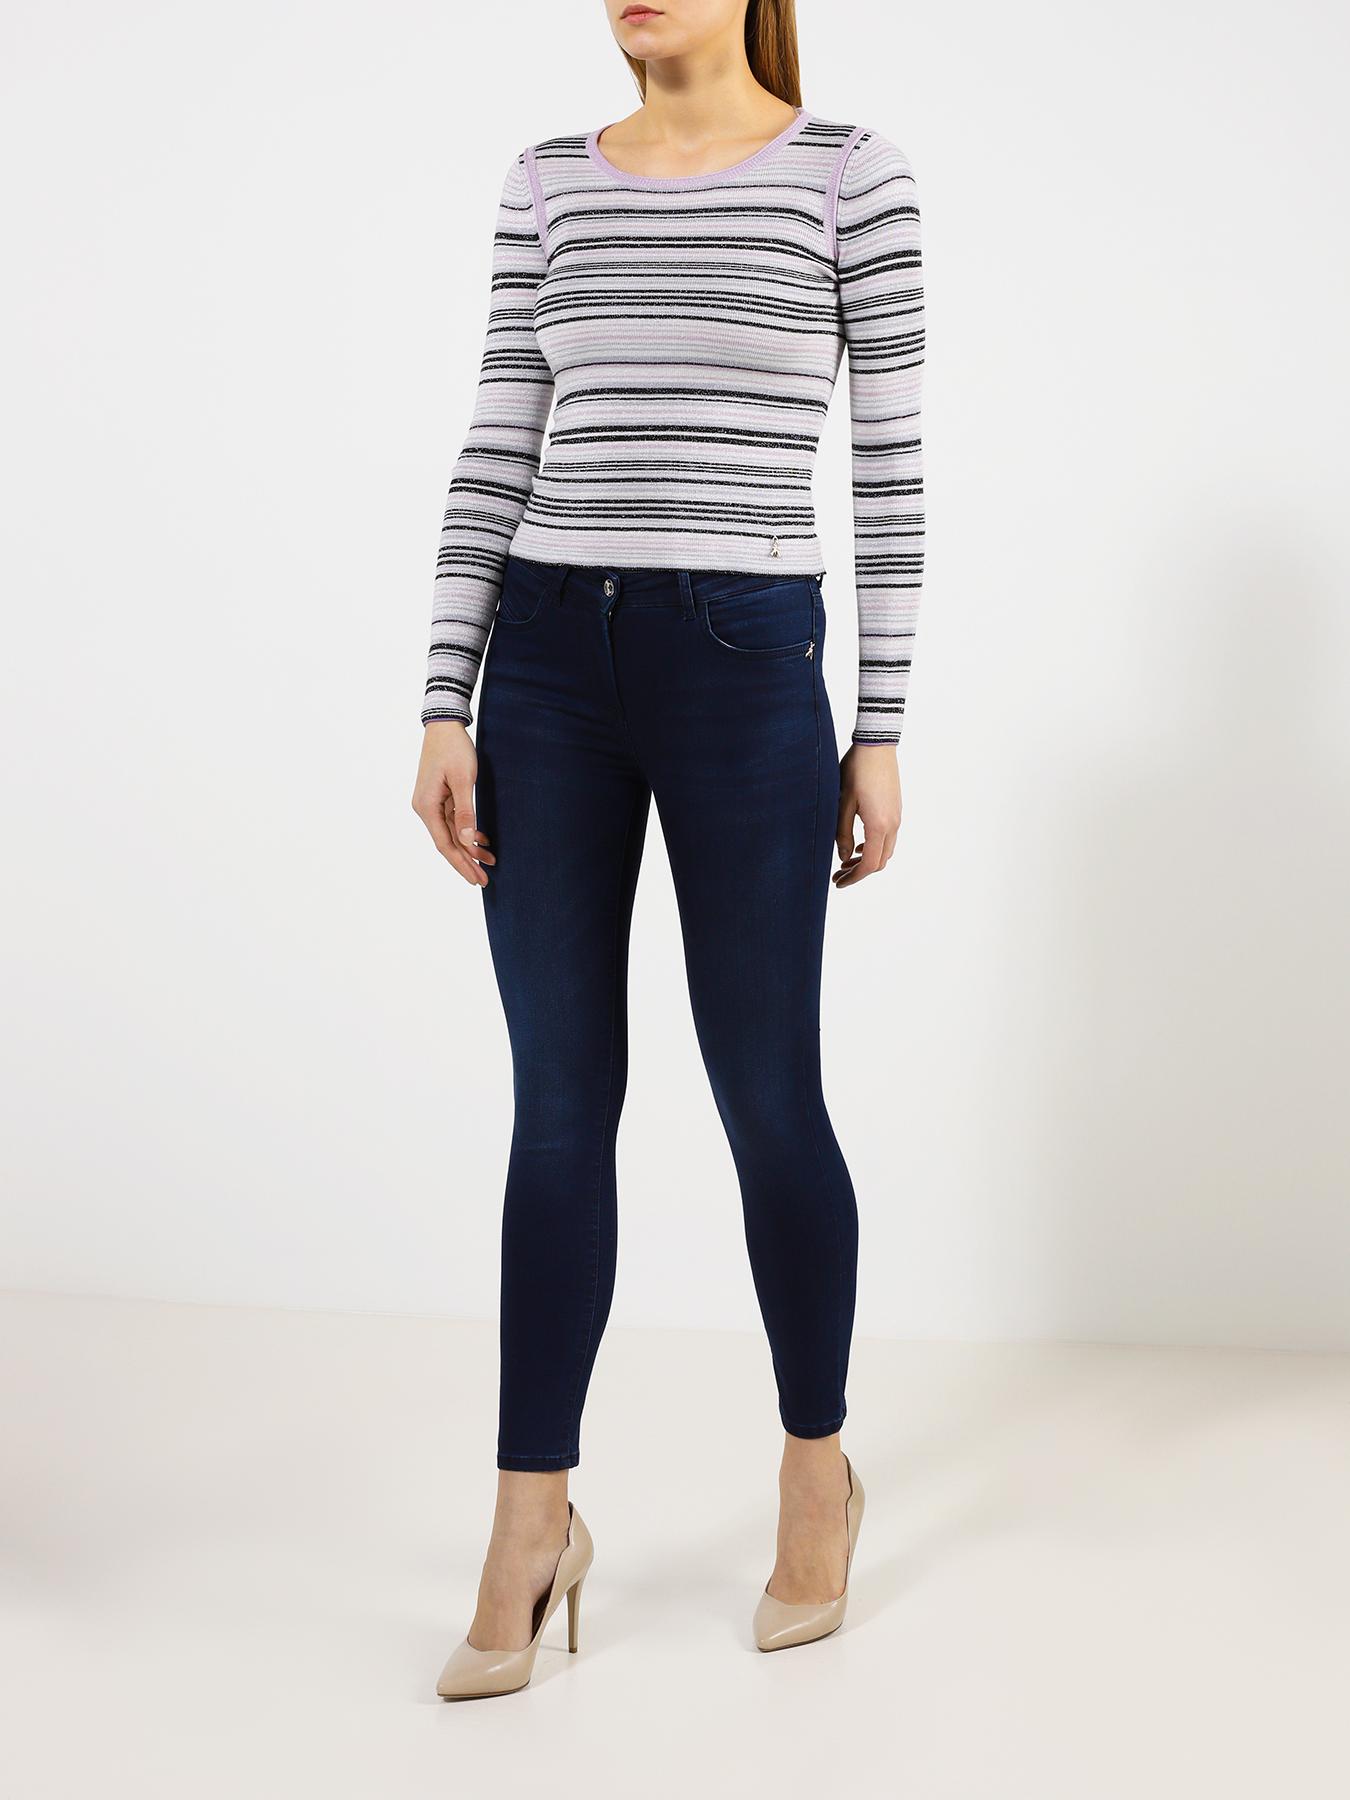 Брюки Patrizia Pepe Облегающие джинсы джинсы patrizia pepe размер 152 0325 белый зеленый